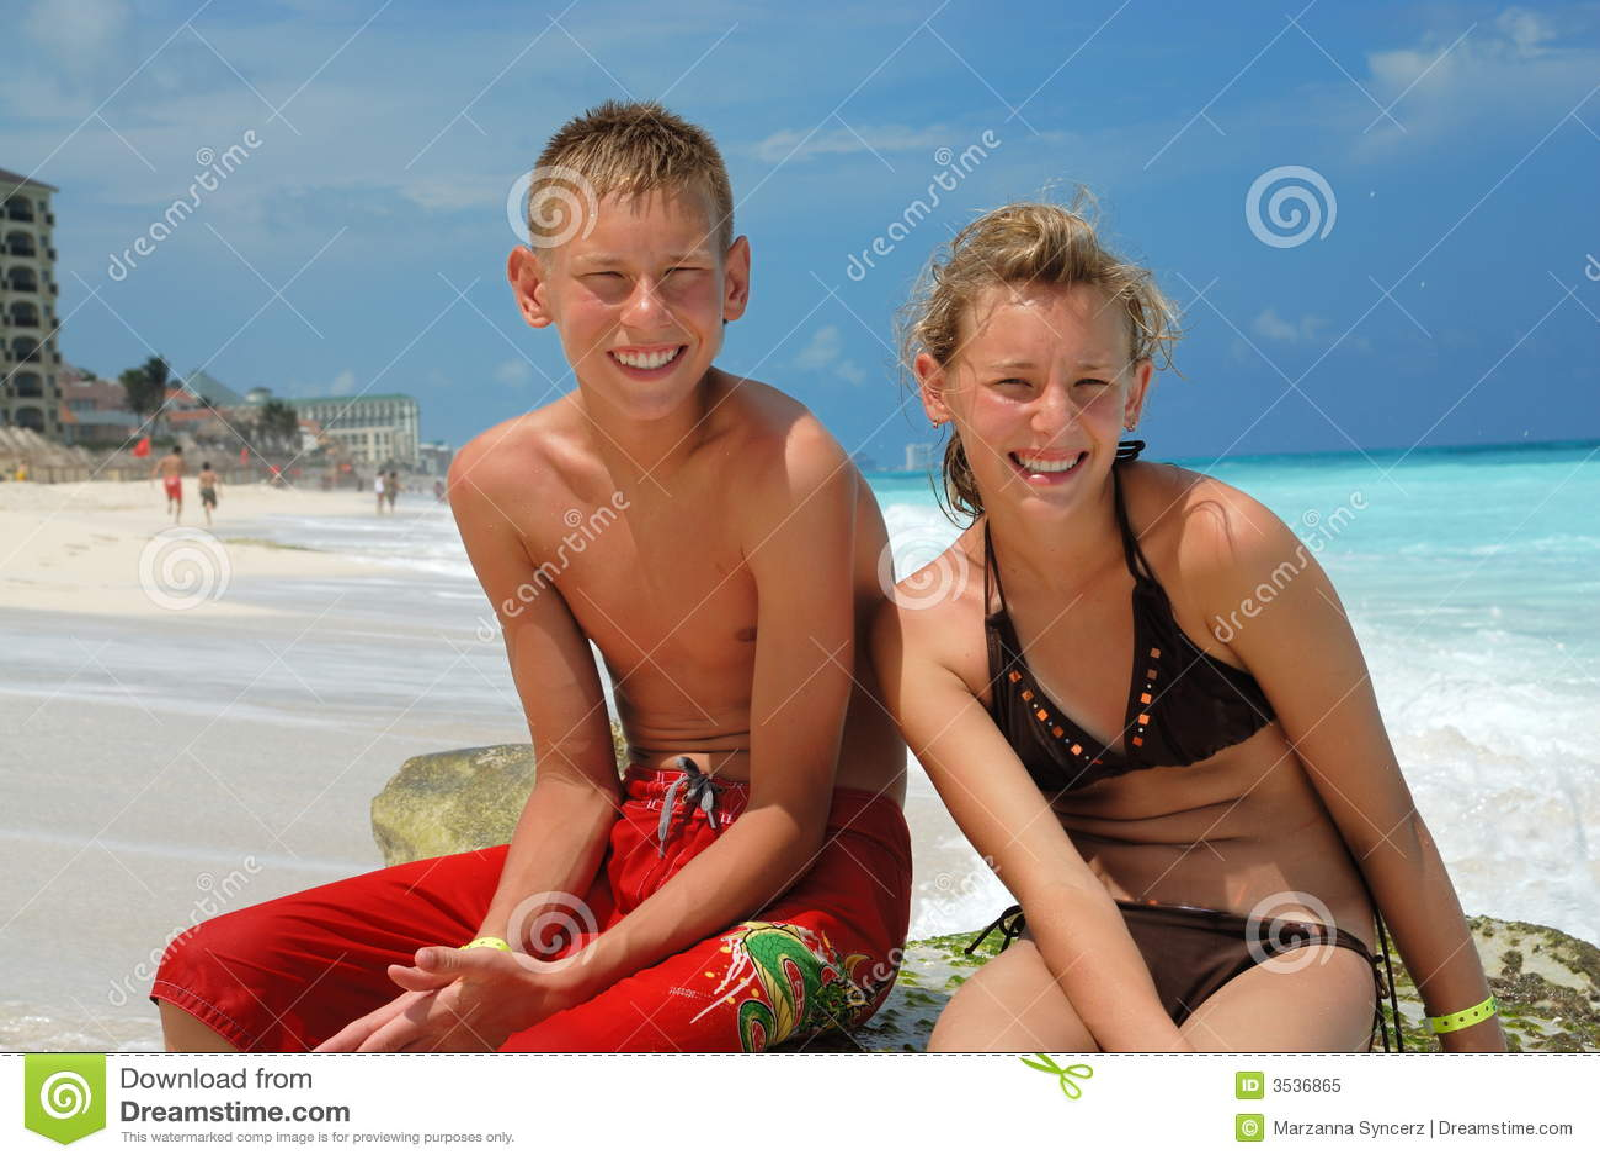 Happy friends at beach